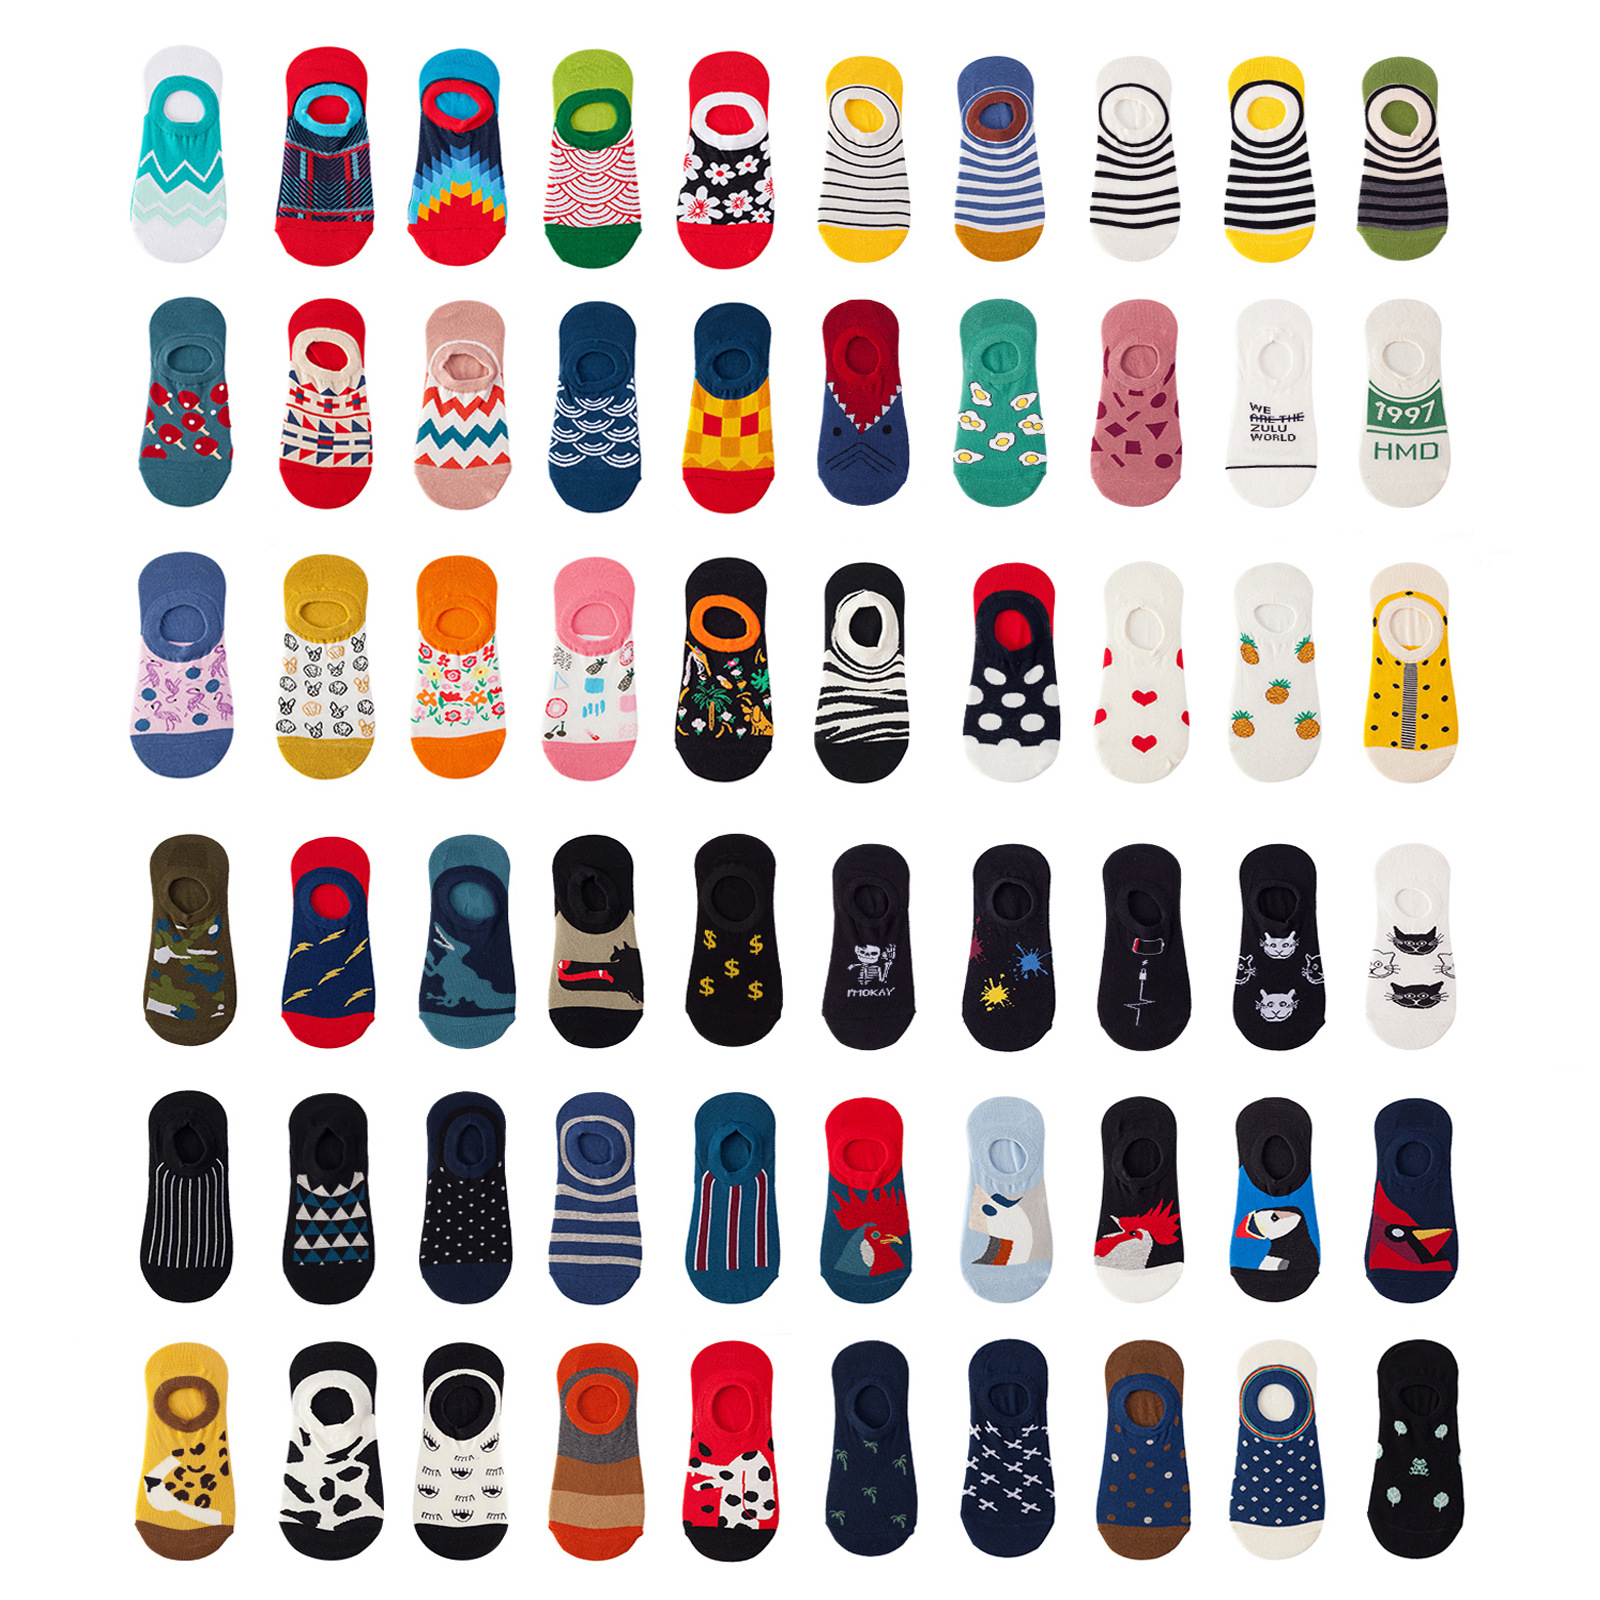 50 Style Summer Korea Socks Men Cartoon Wavy Striped Flower Dot Cat Socks Cute Animal Funny Ankle Socks Cotton Invisible Socks